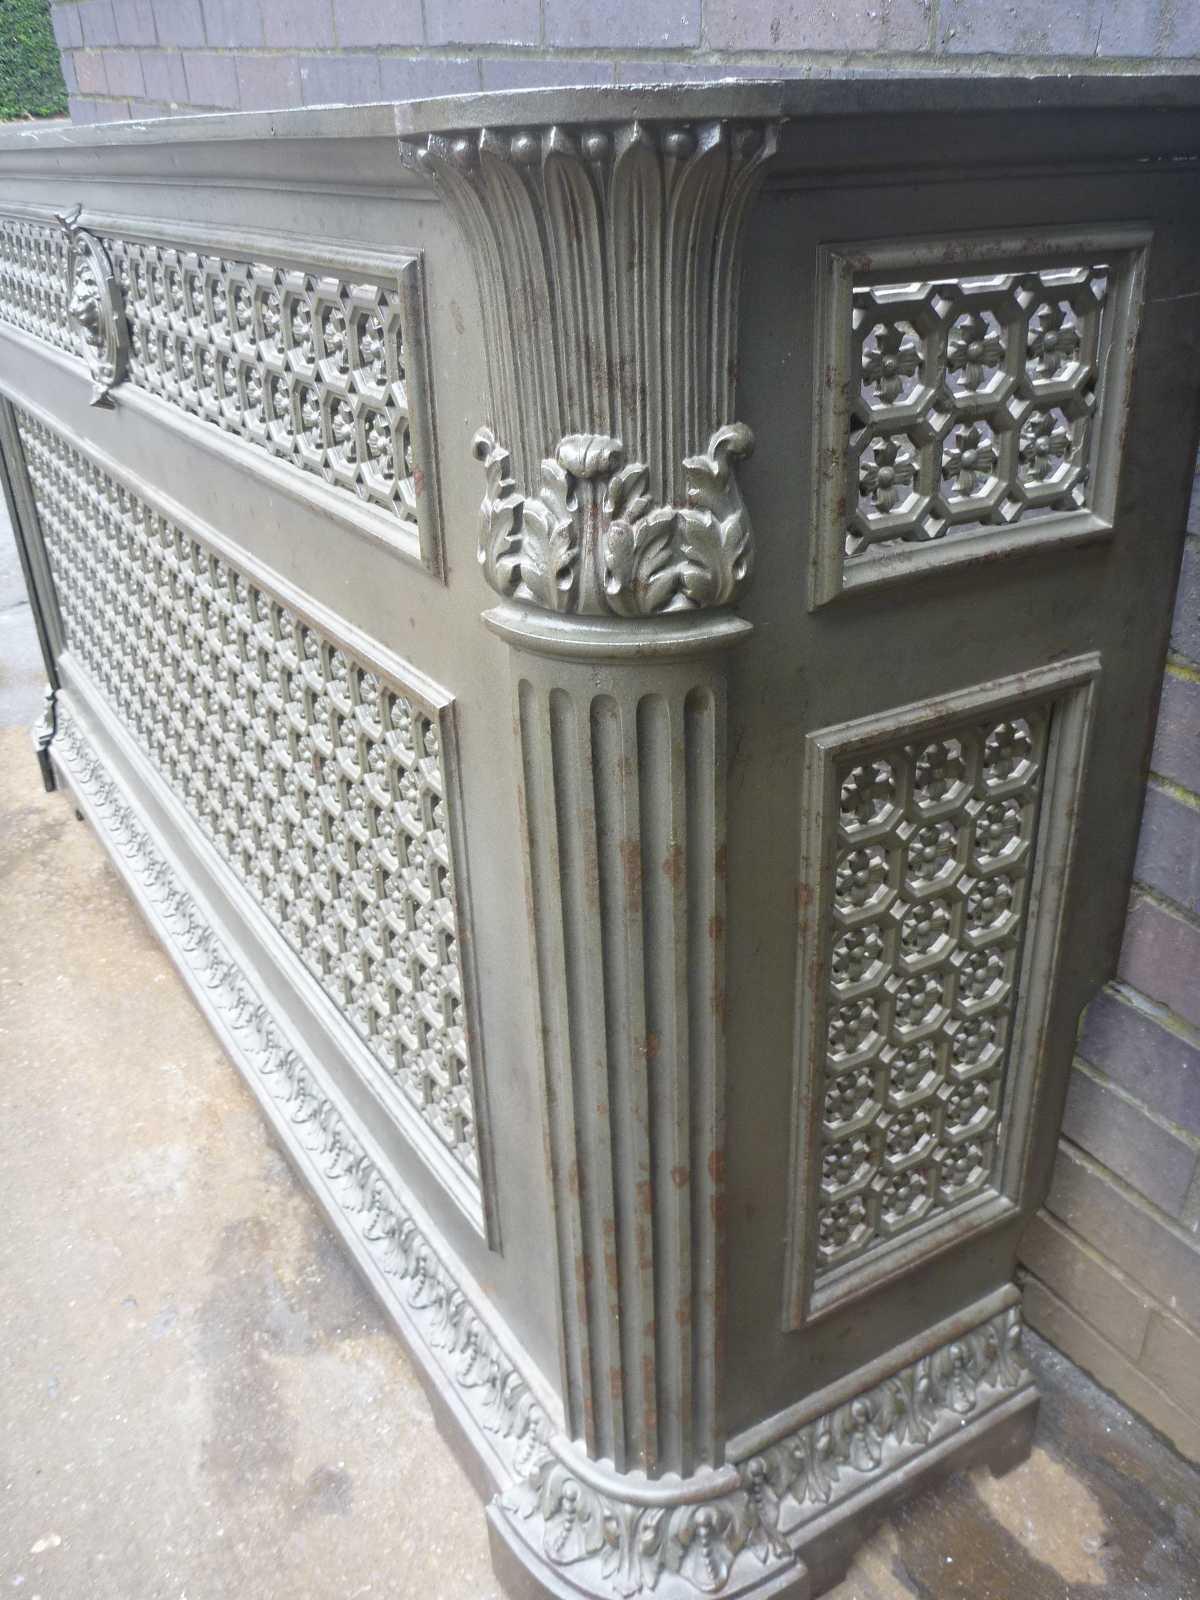 Cast iron radiator cover blast spray polish - Cast iron radiator covers ...